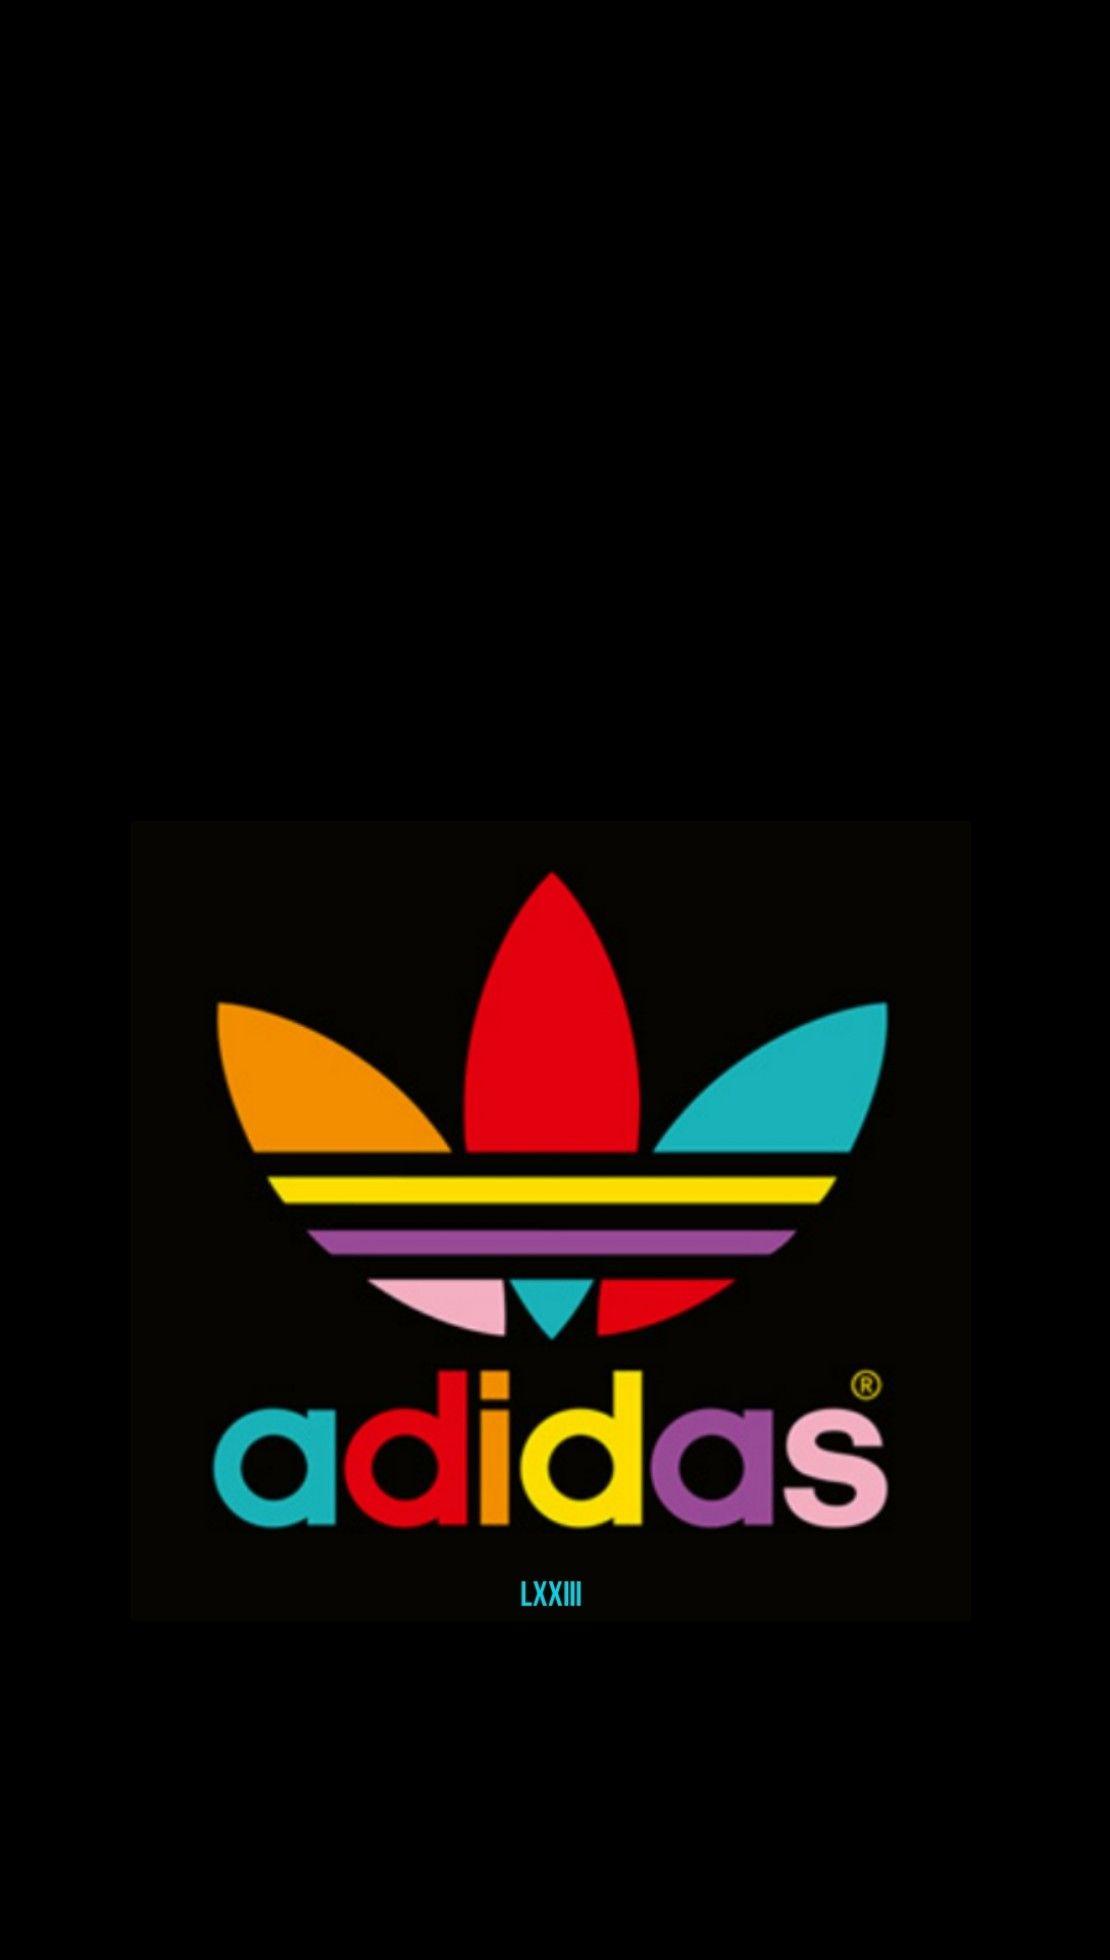 Colorful Adidas On Black Wallpaper Adidas Logo Wallpapers Adidas Wallpapers Adidas Iphone Wallpaper